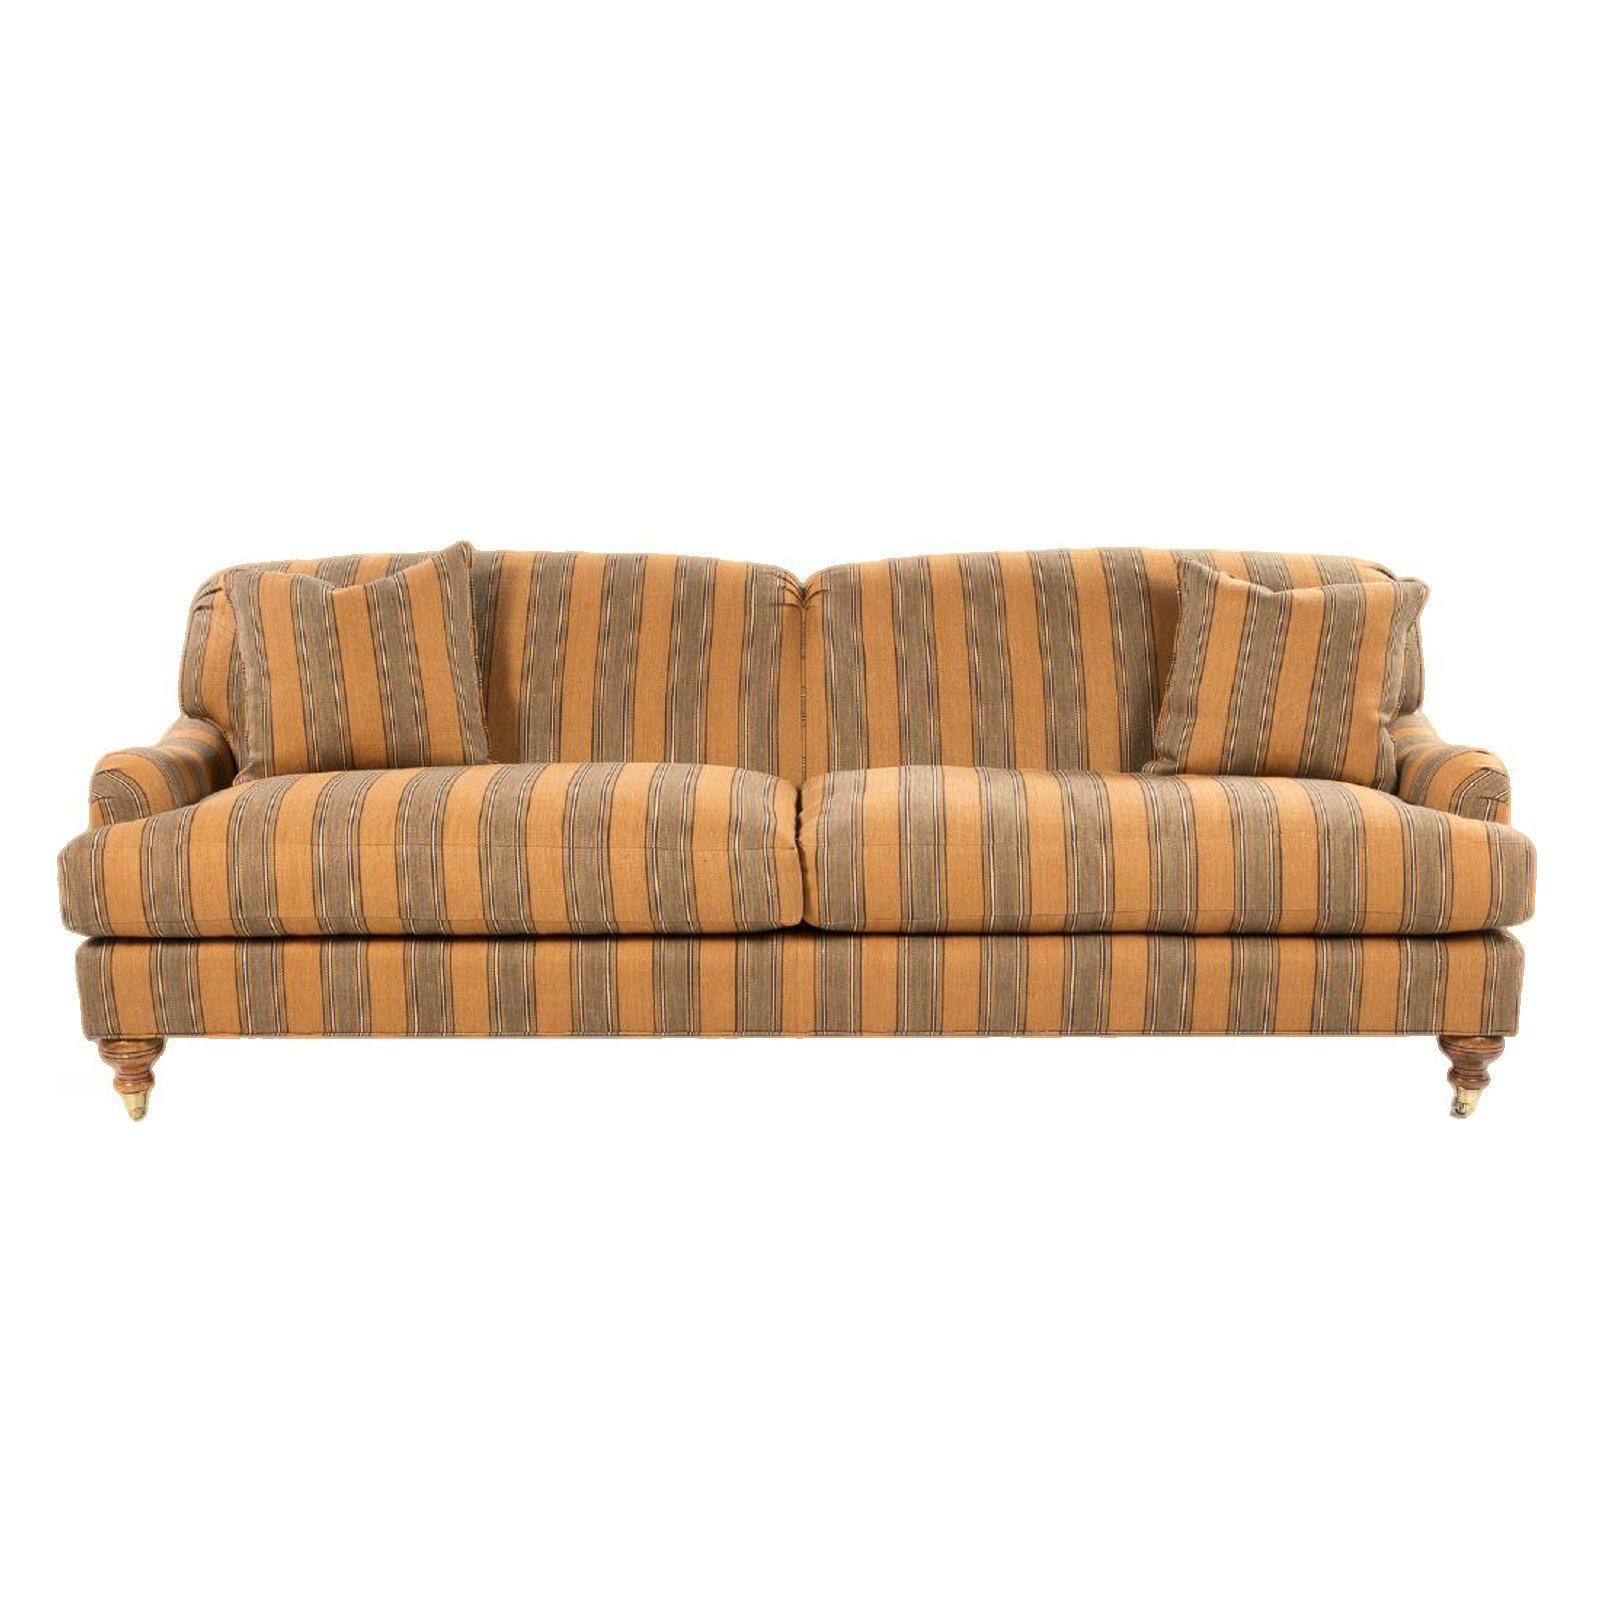 19th Century Art Deco Edwardian Sweetheart Herringbone Sofa